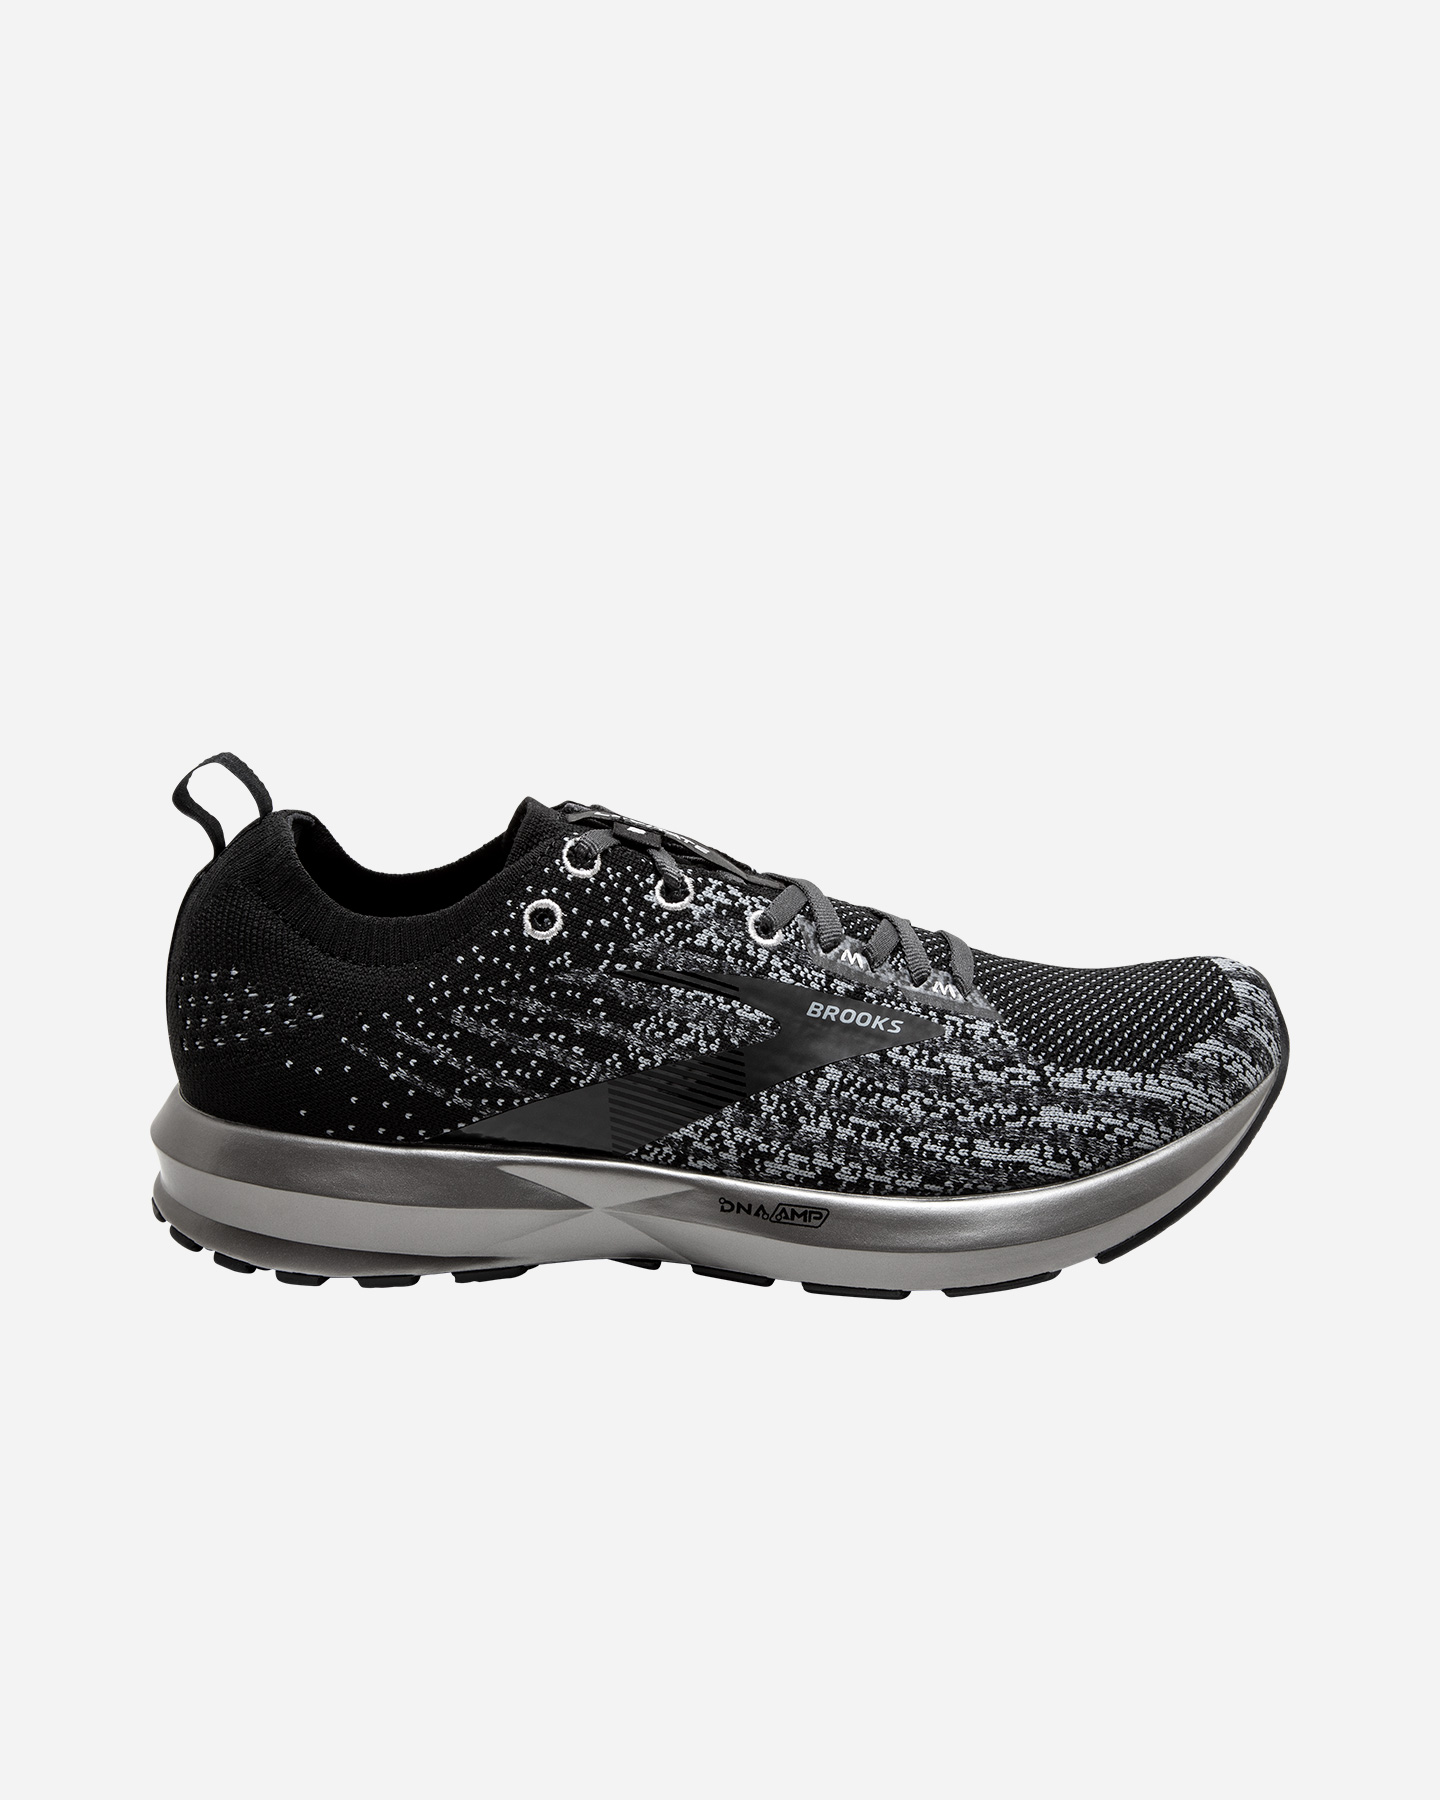 Brooks levitate 3 sneaker running uomo, Sneakers brand